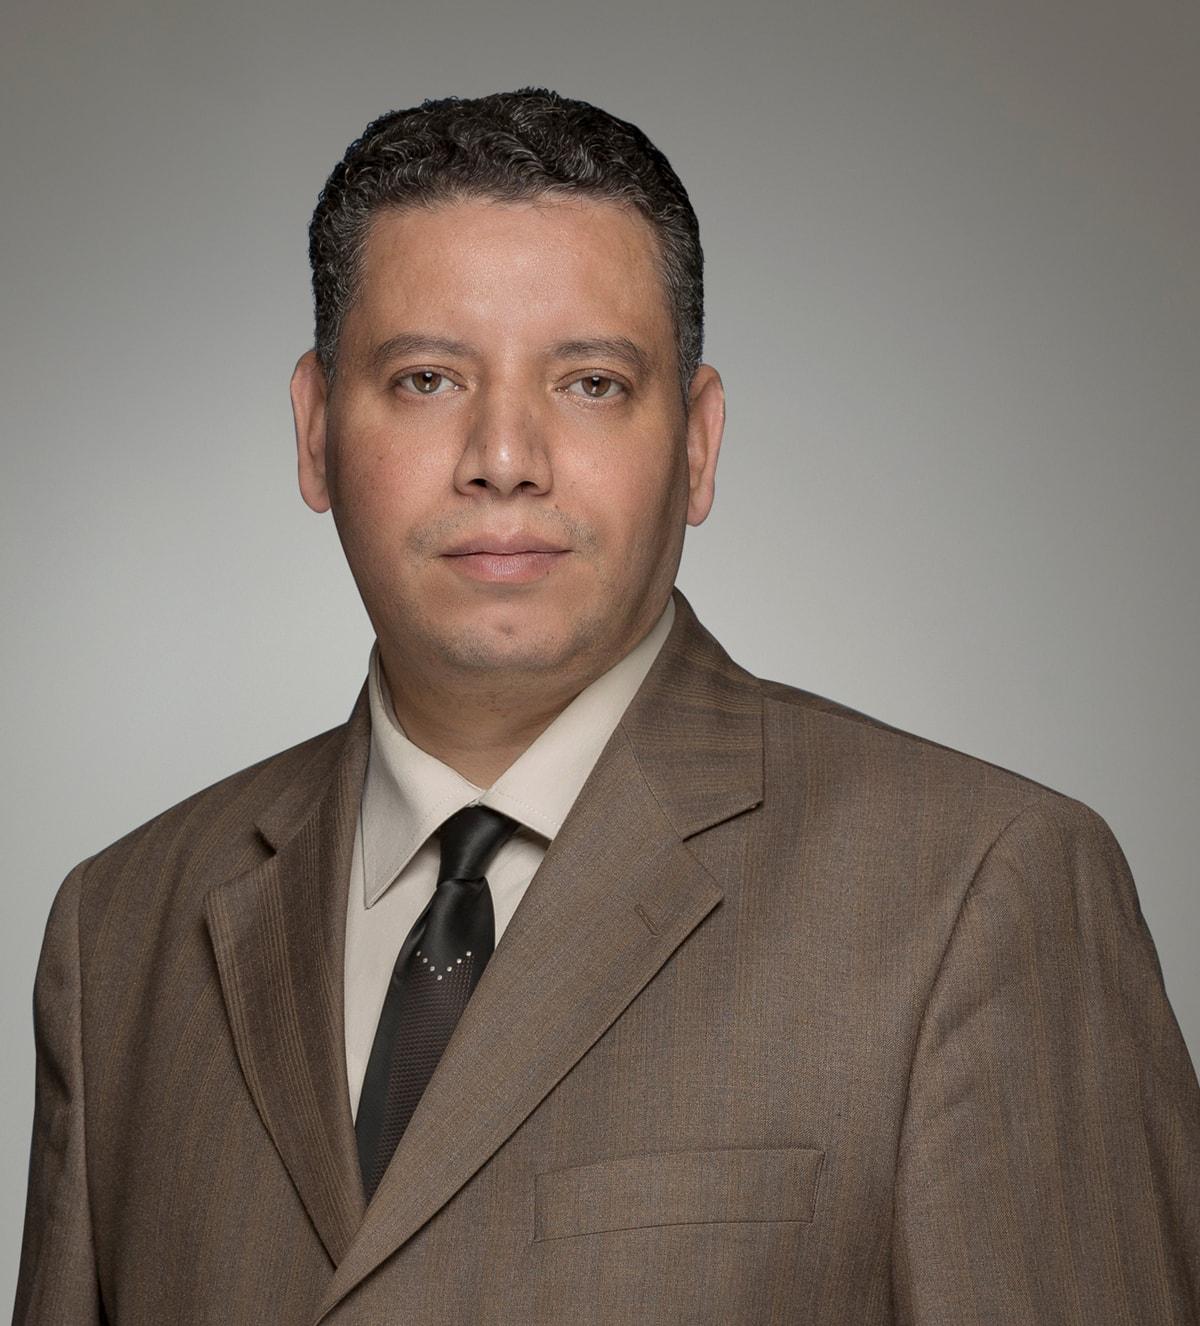 Hossam Khamis